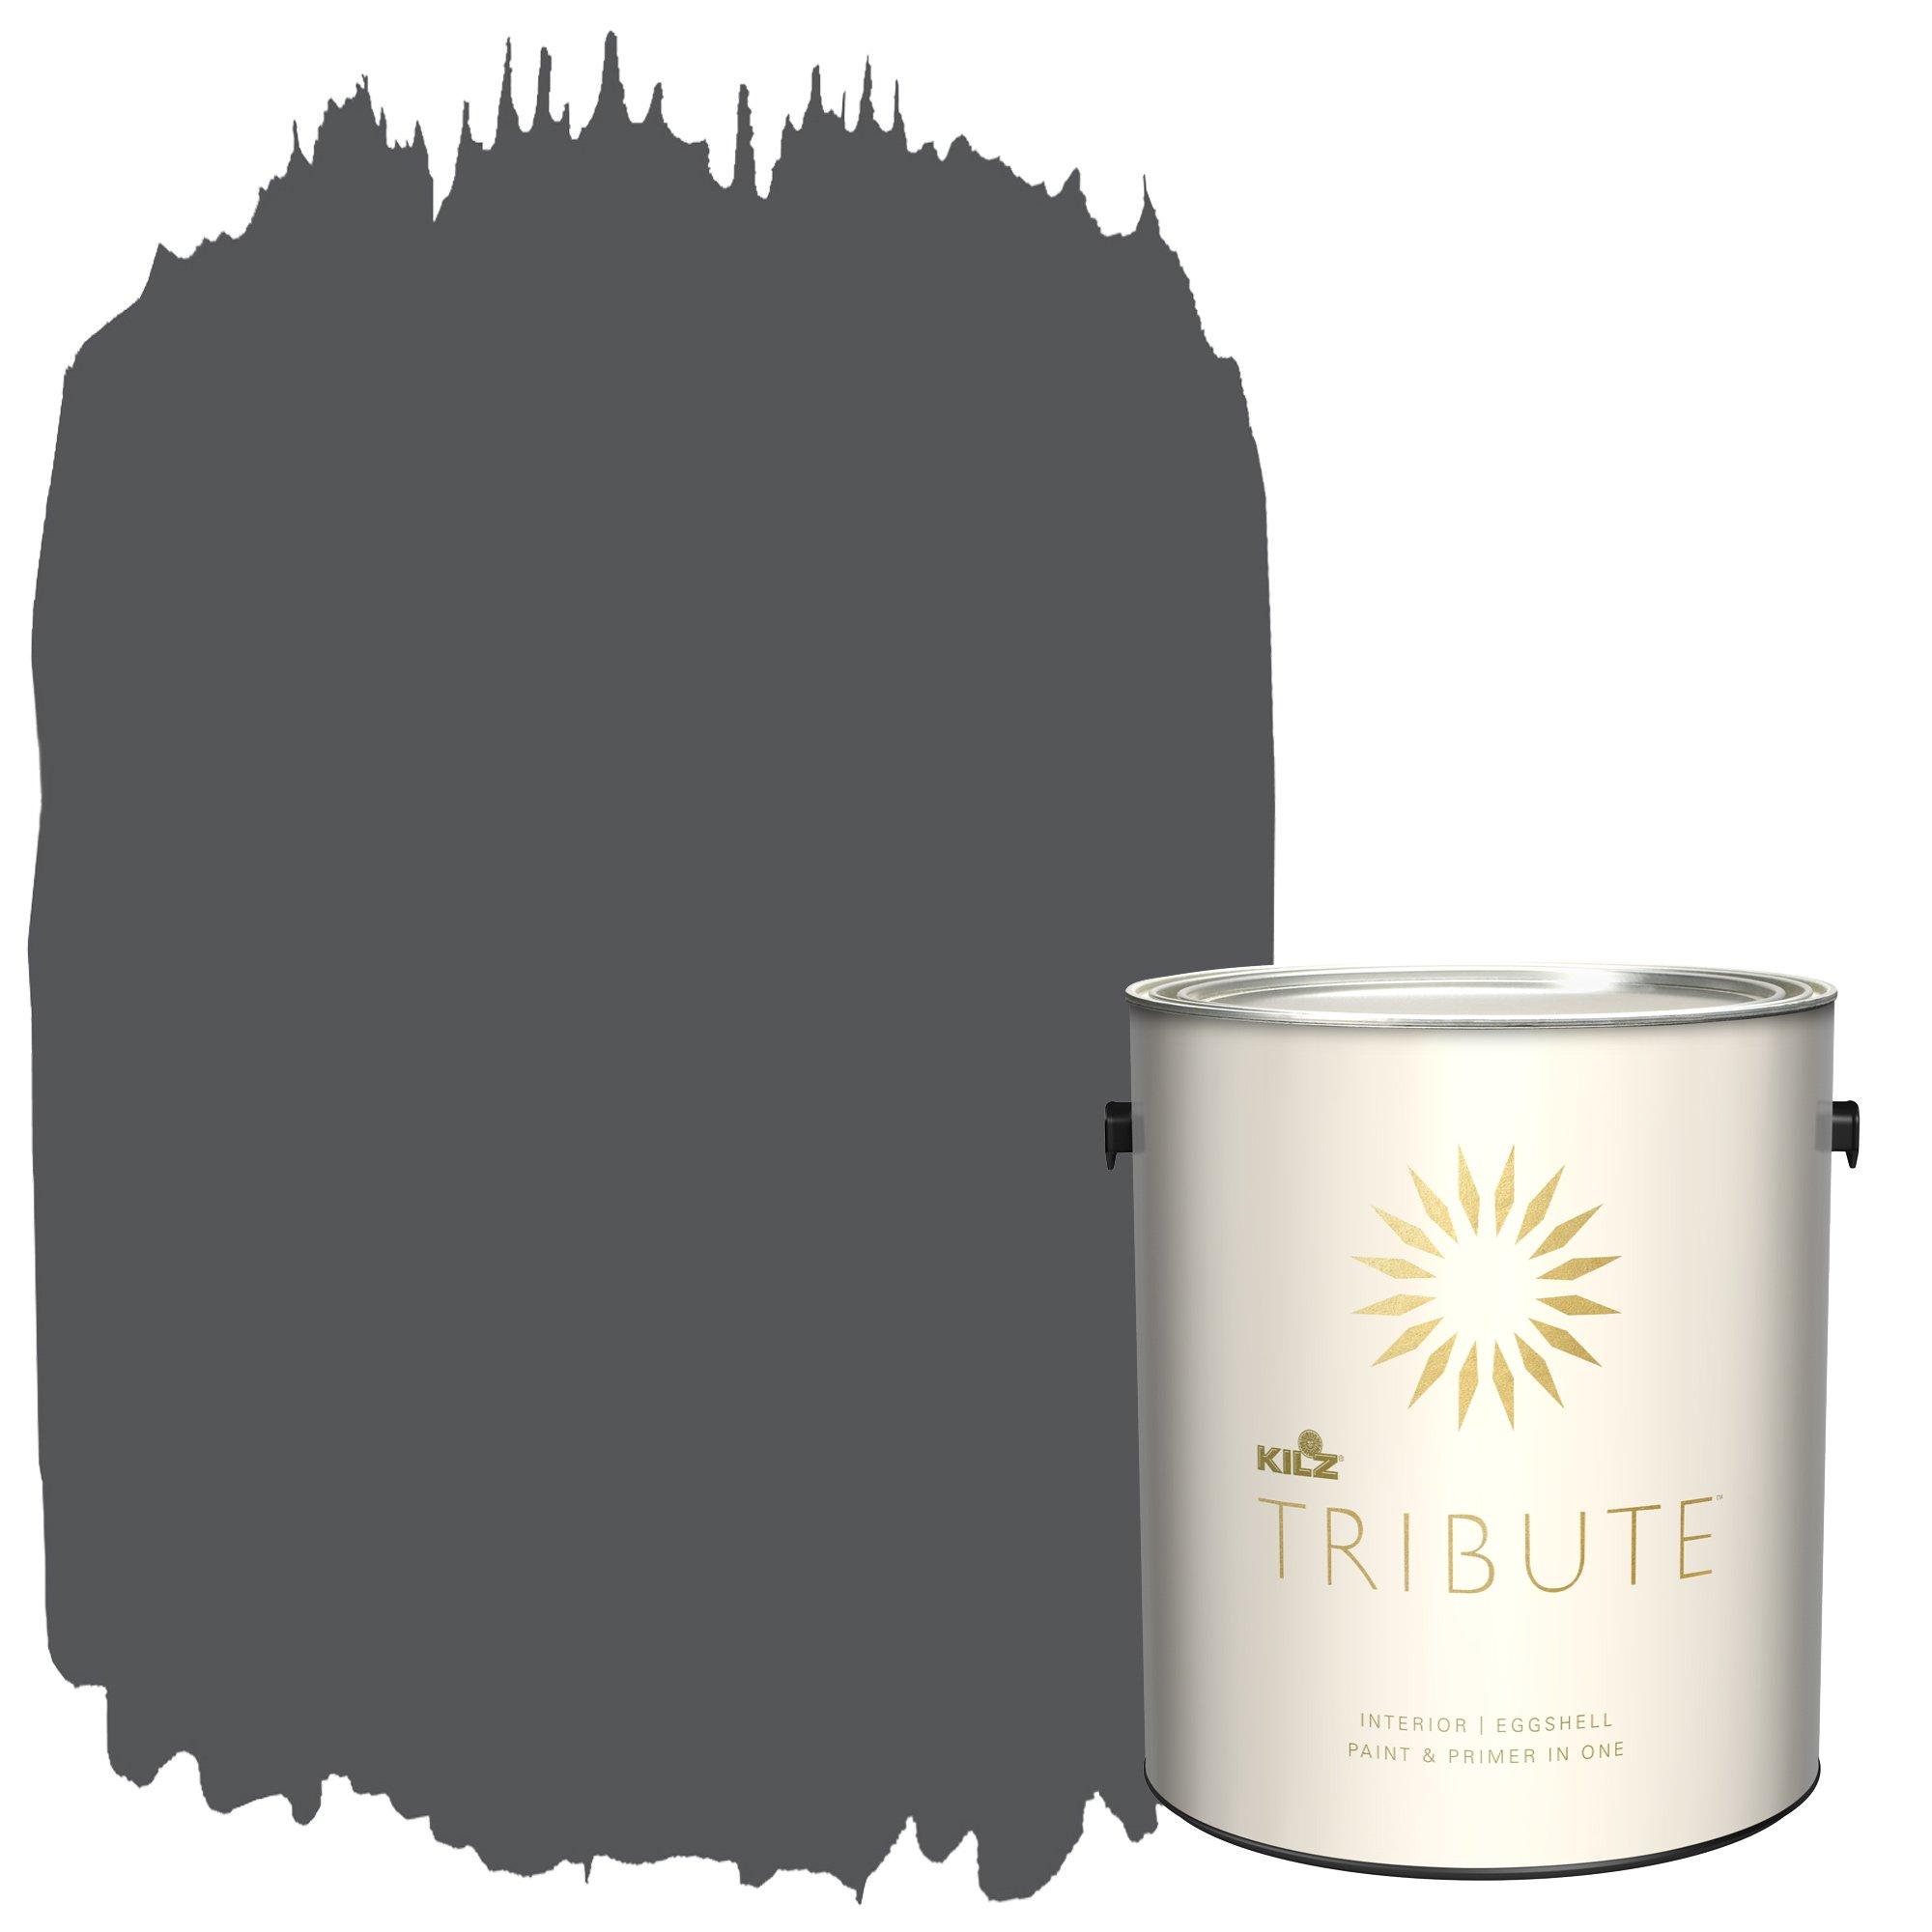 KILZ TRIBUTE Interior Eggshell Paint and Primer in One, 1 Gallon, Motor Gray (TB-38)